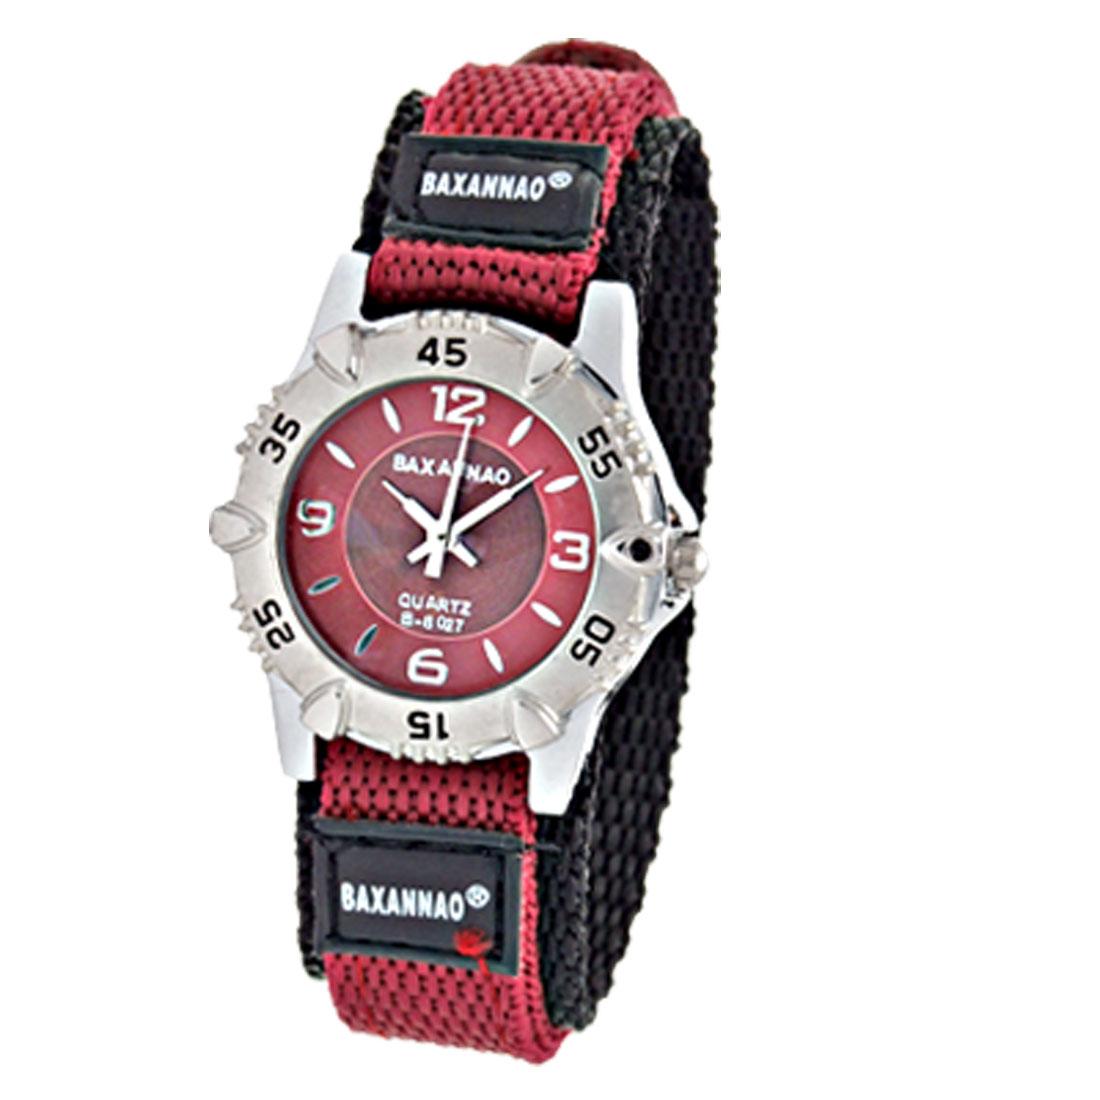 Crimson and Black Nylon Watchband 's Quartz Watch